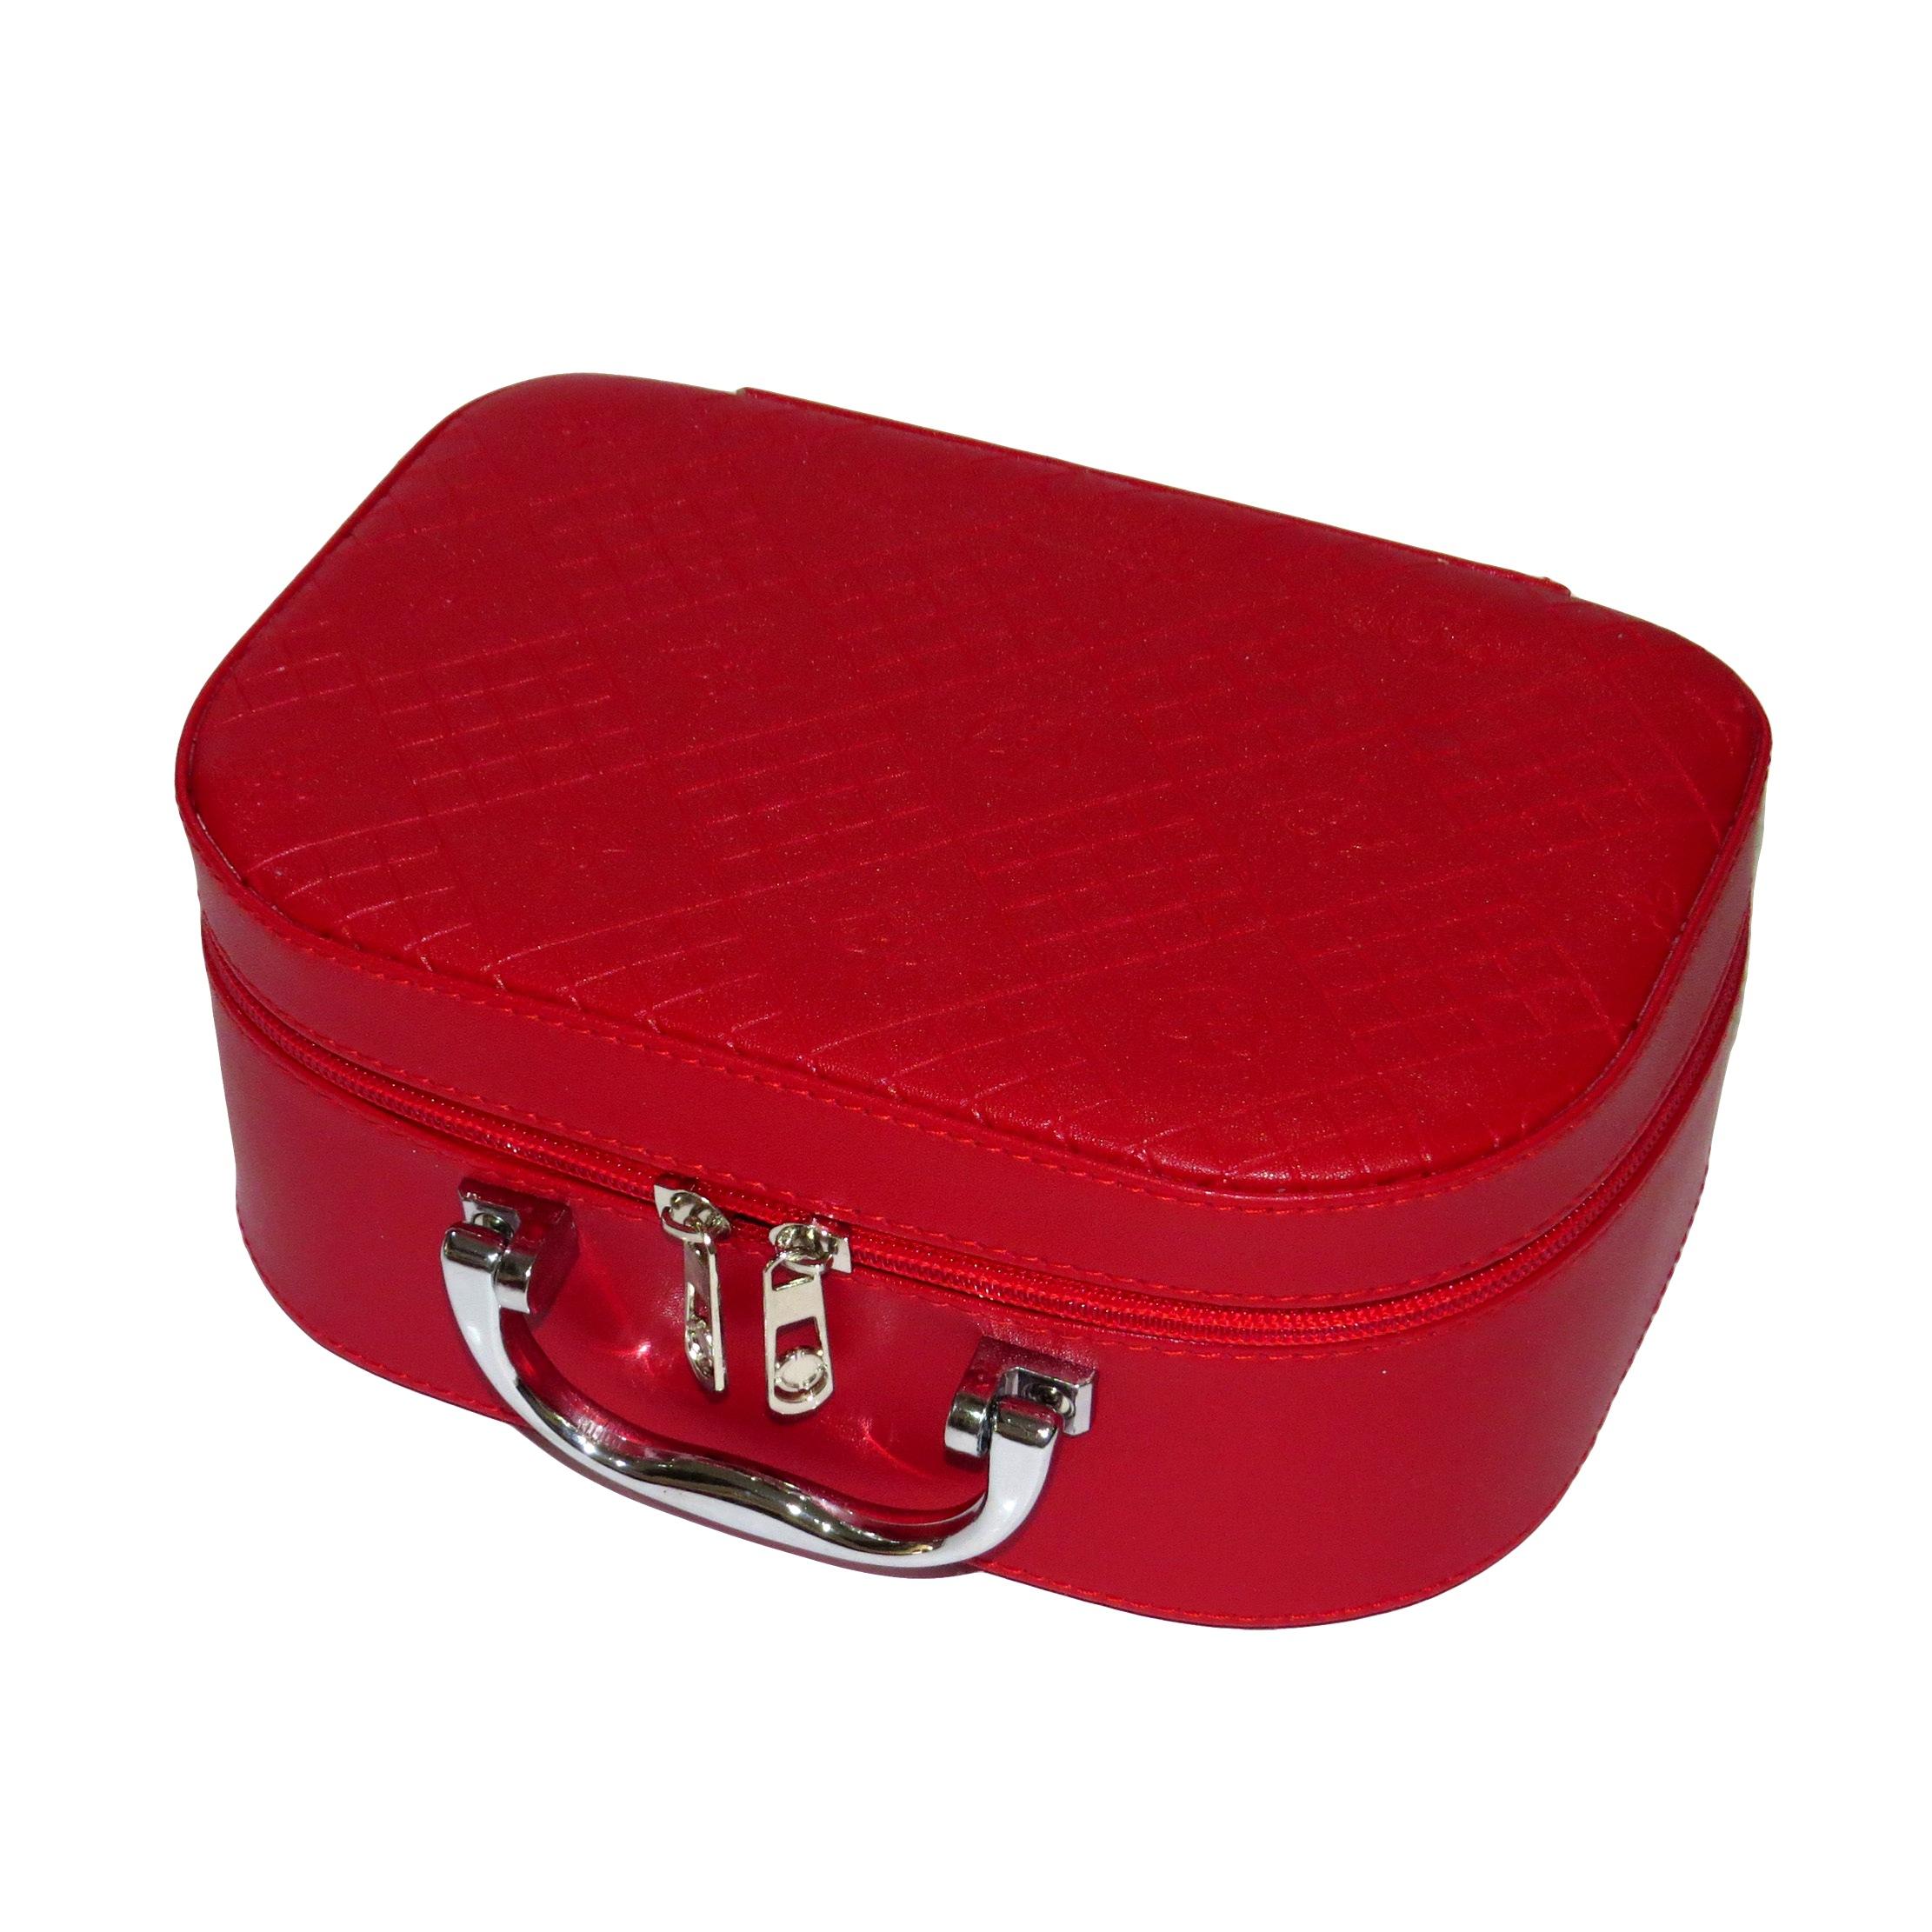 قیمت جعبه لوازم آرایشی کد DL_953_11